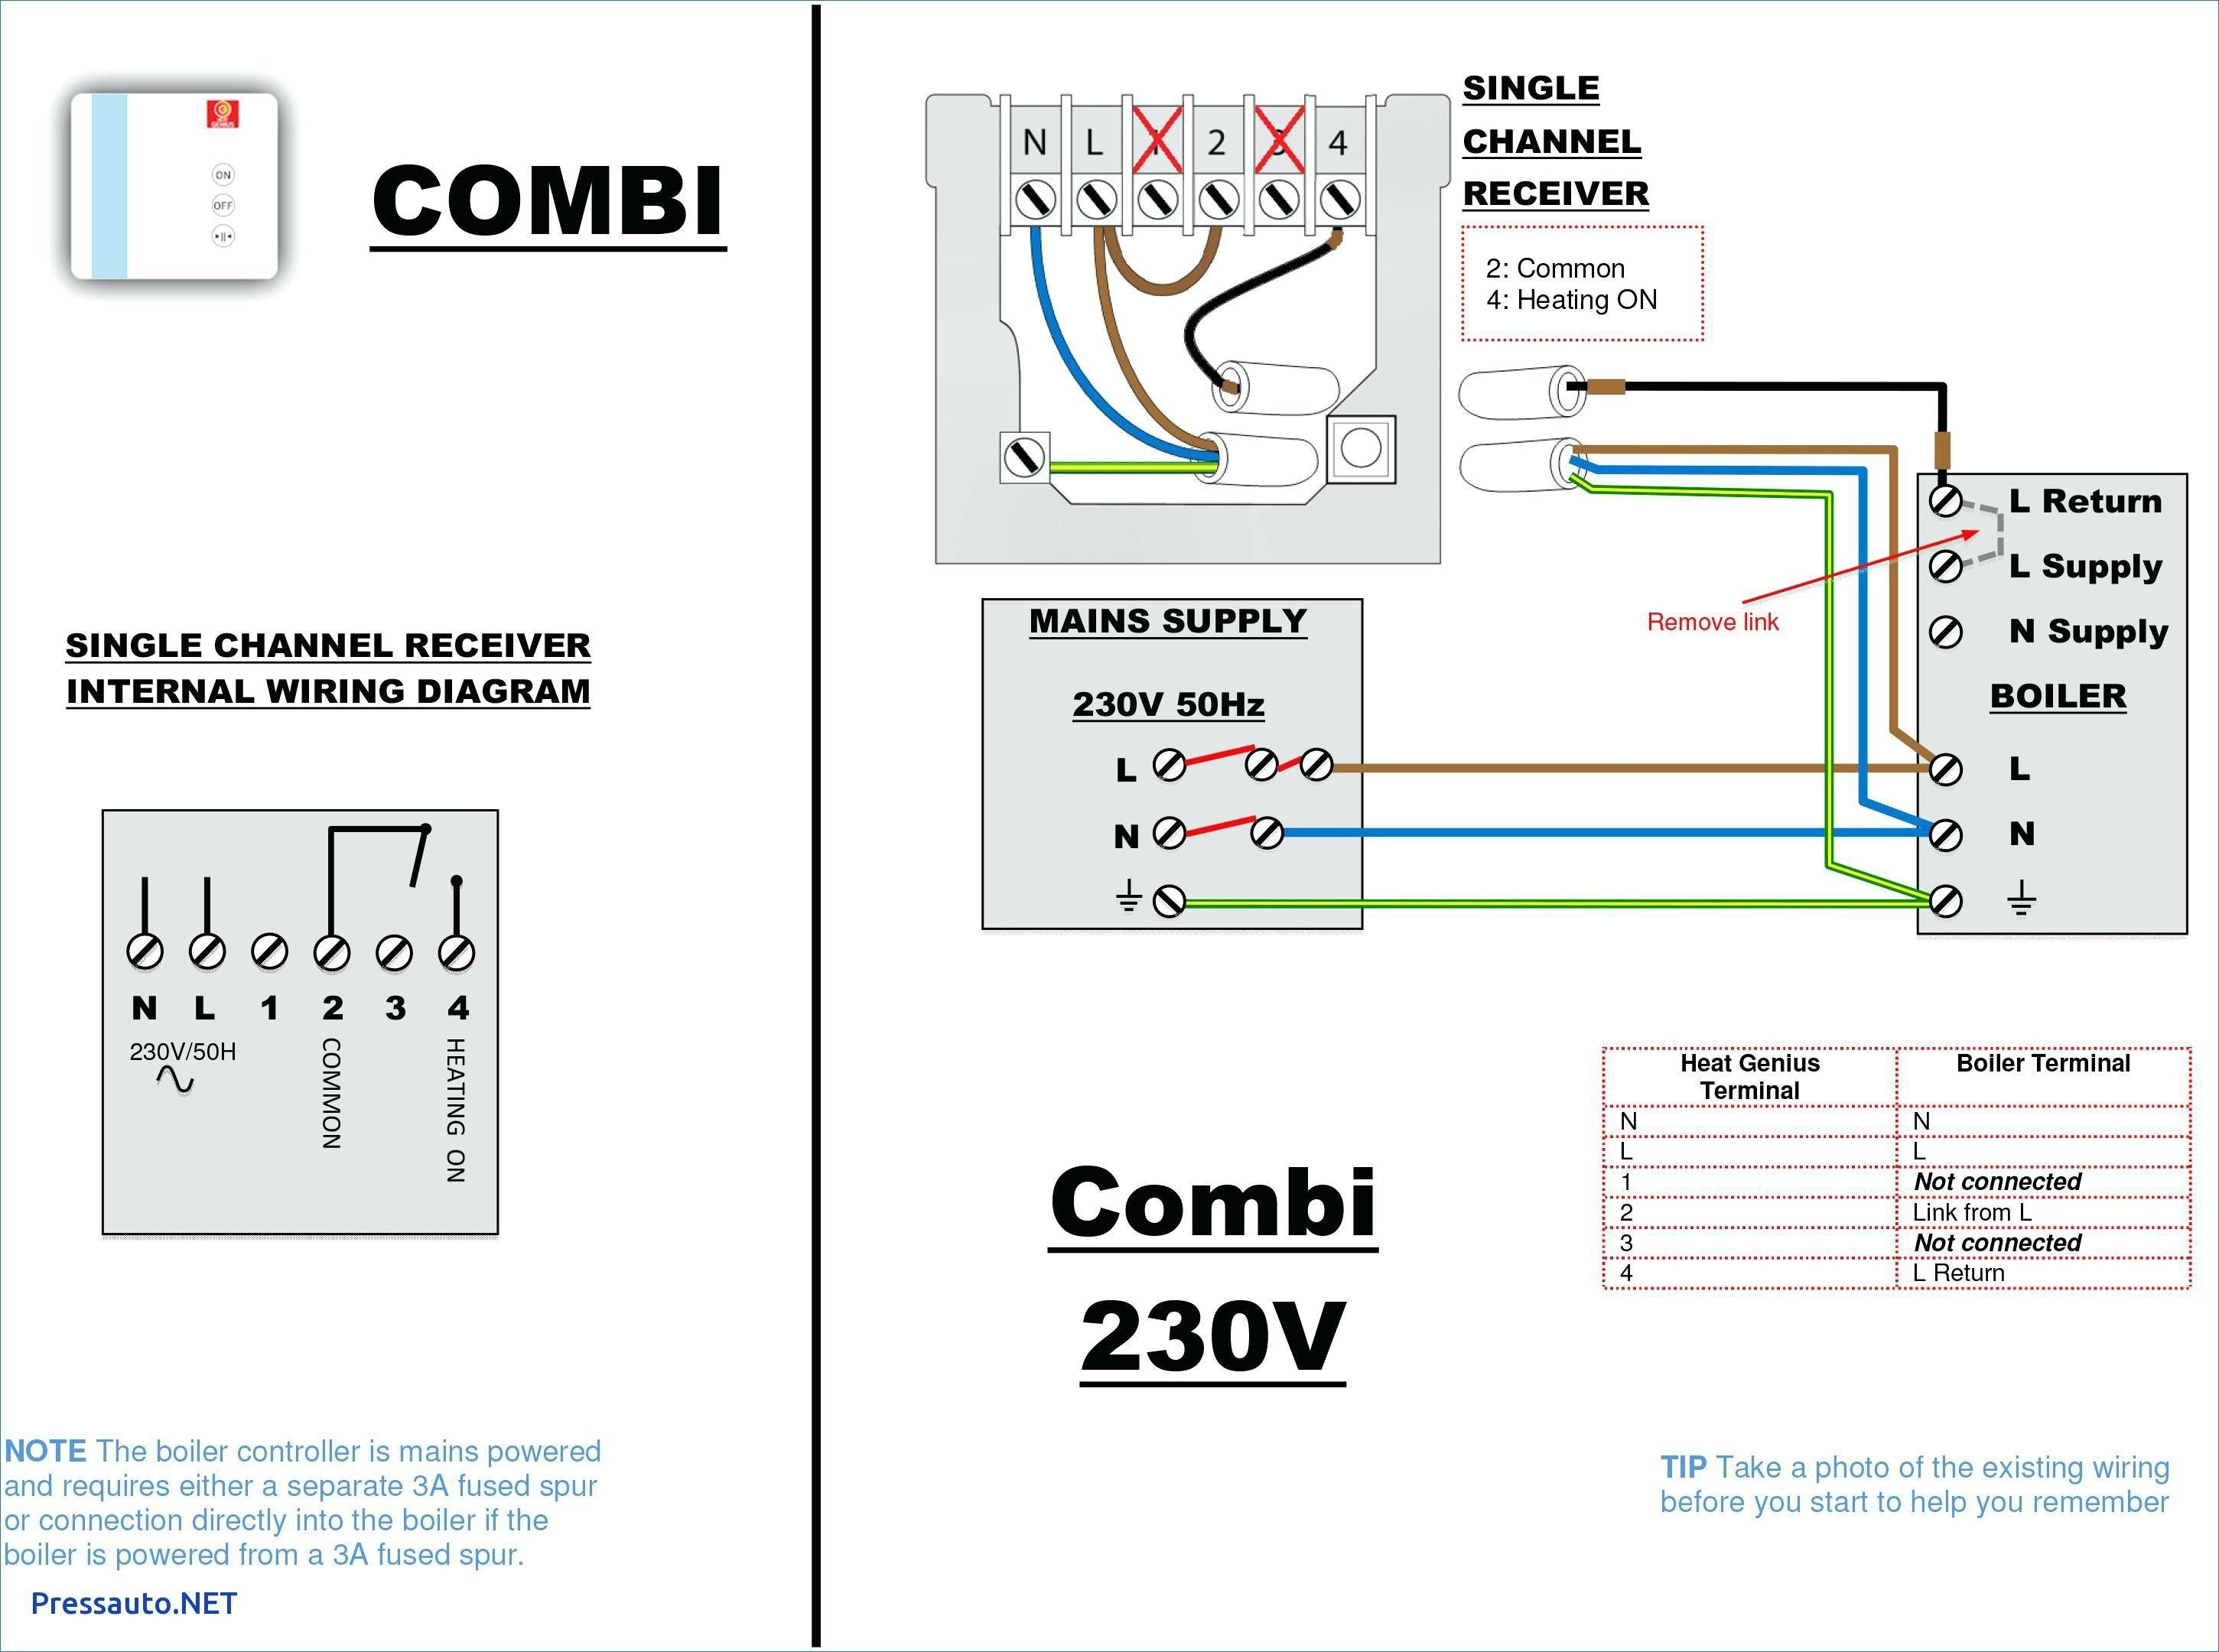 wiring diagram for fahrenheat electric baseboard heater diagram diagramtemplate diagramsample [ 2901 x 2160 Pixel ]